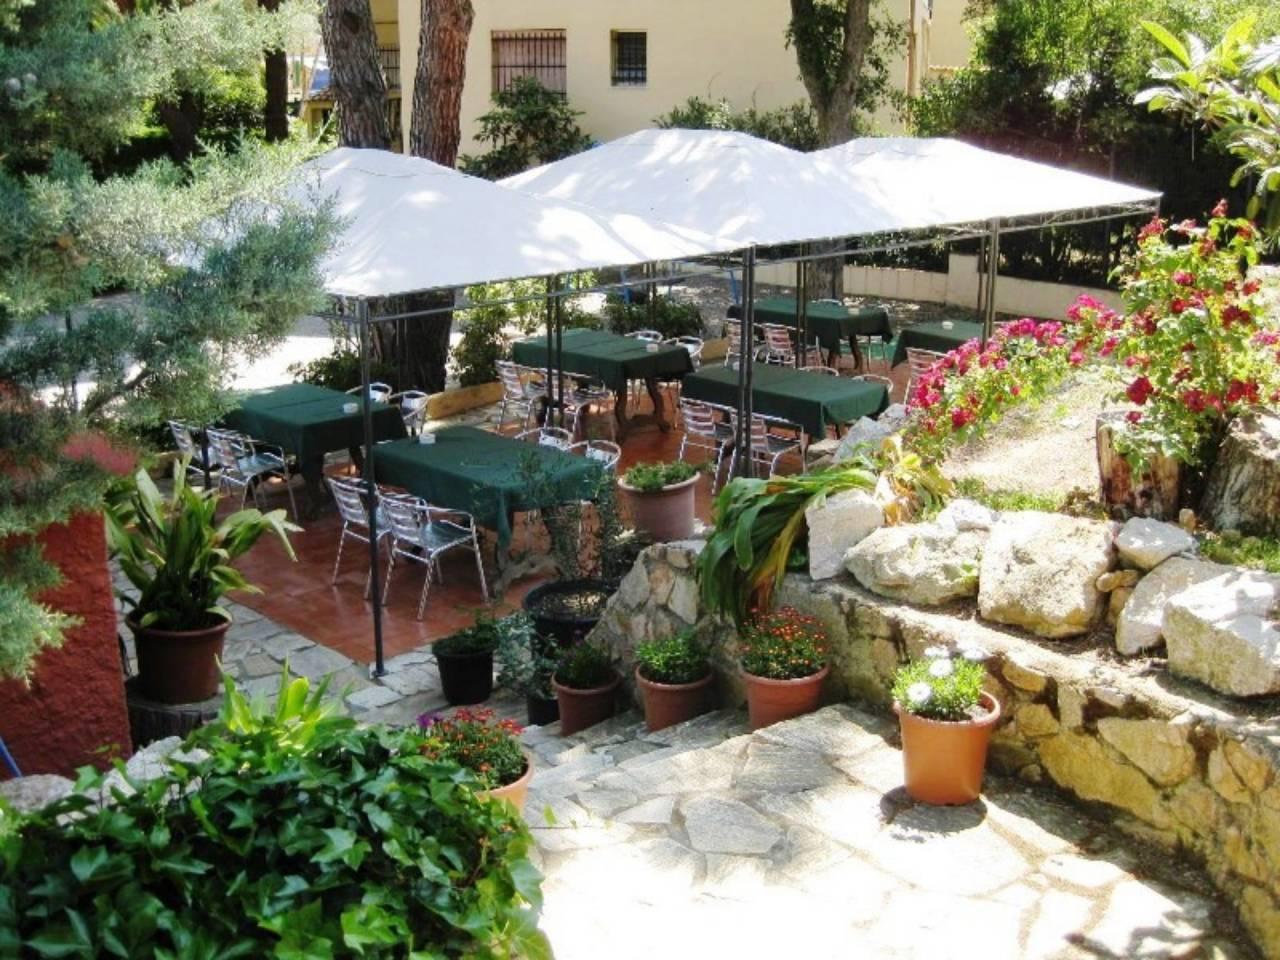 Local Comercial  Calle carretera s´agaró - castell d´aro. Restaurante en venta estilo rústico en s'agaró para reformar, an